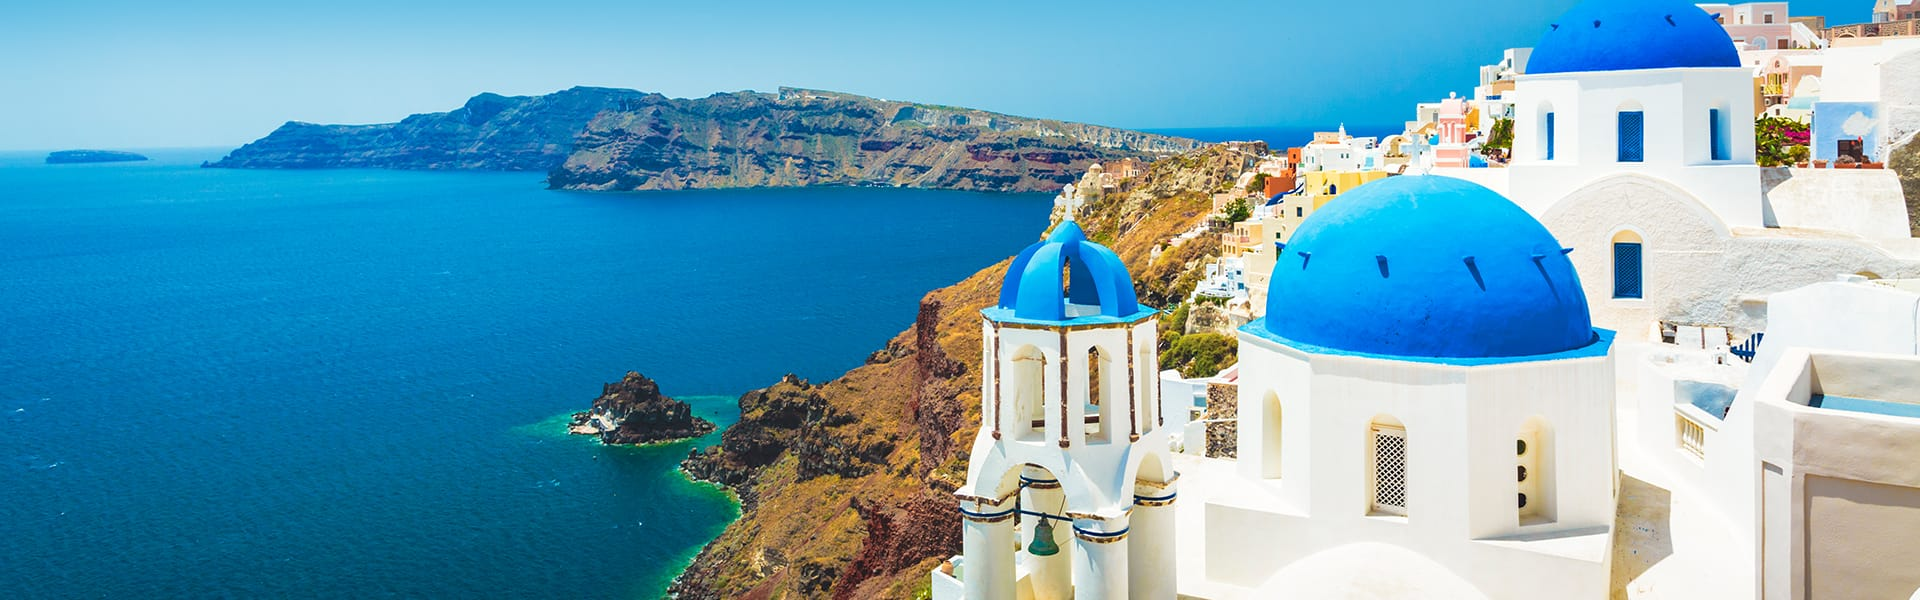 Greek Isles: Santorini, Patmos & Israel